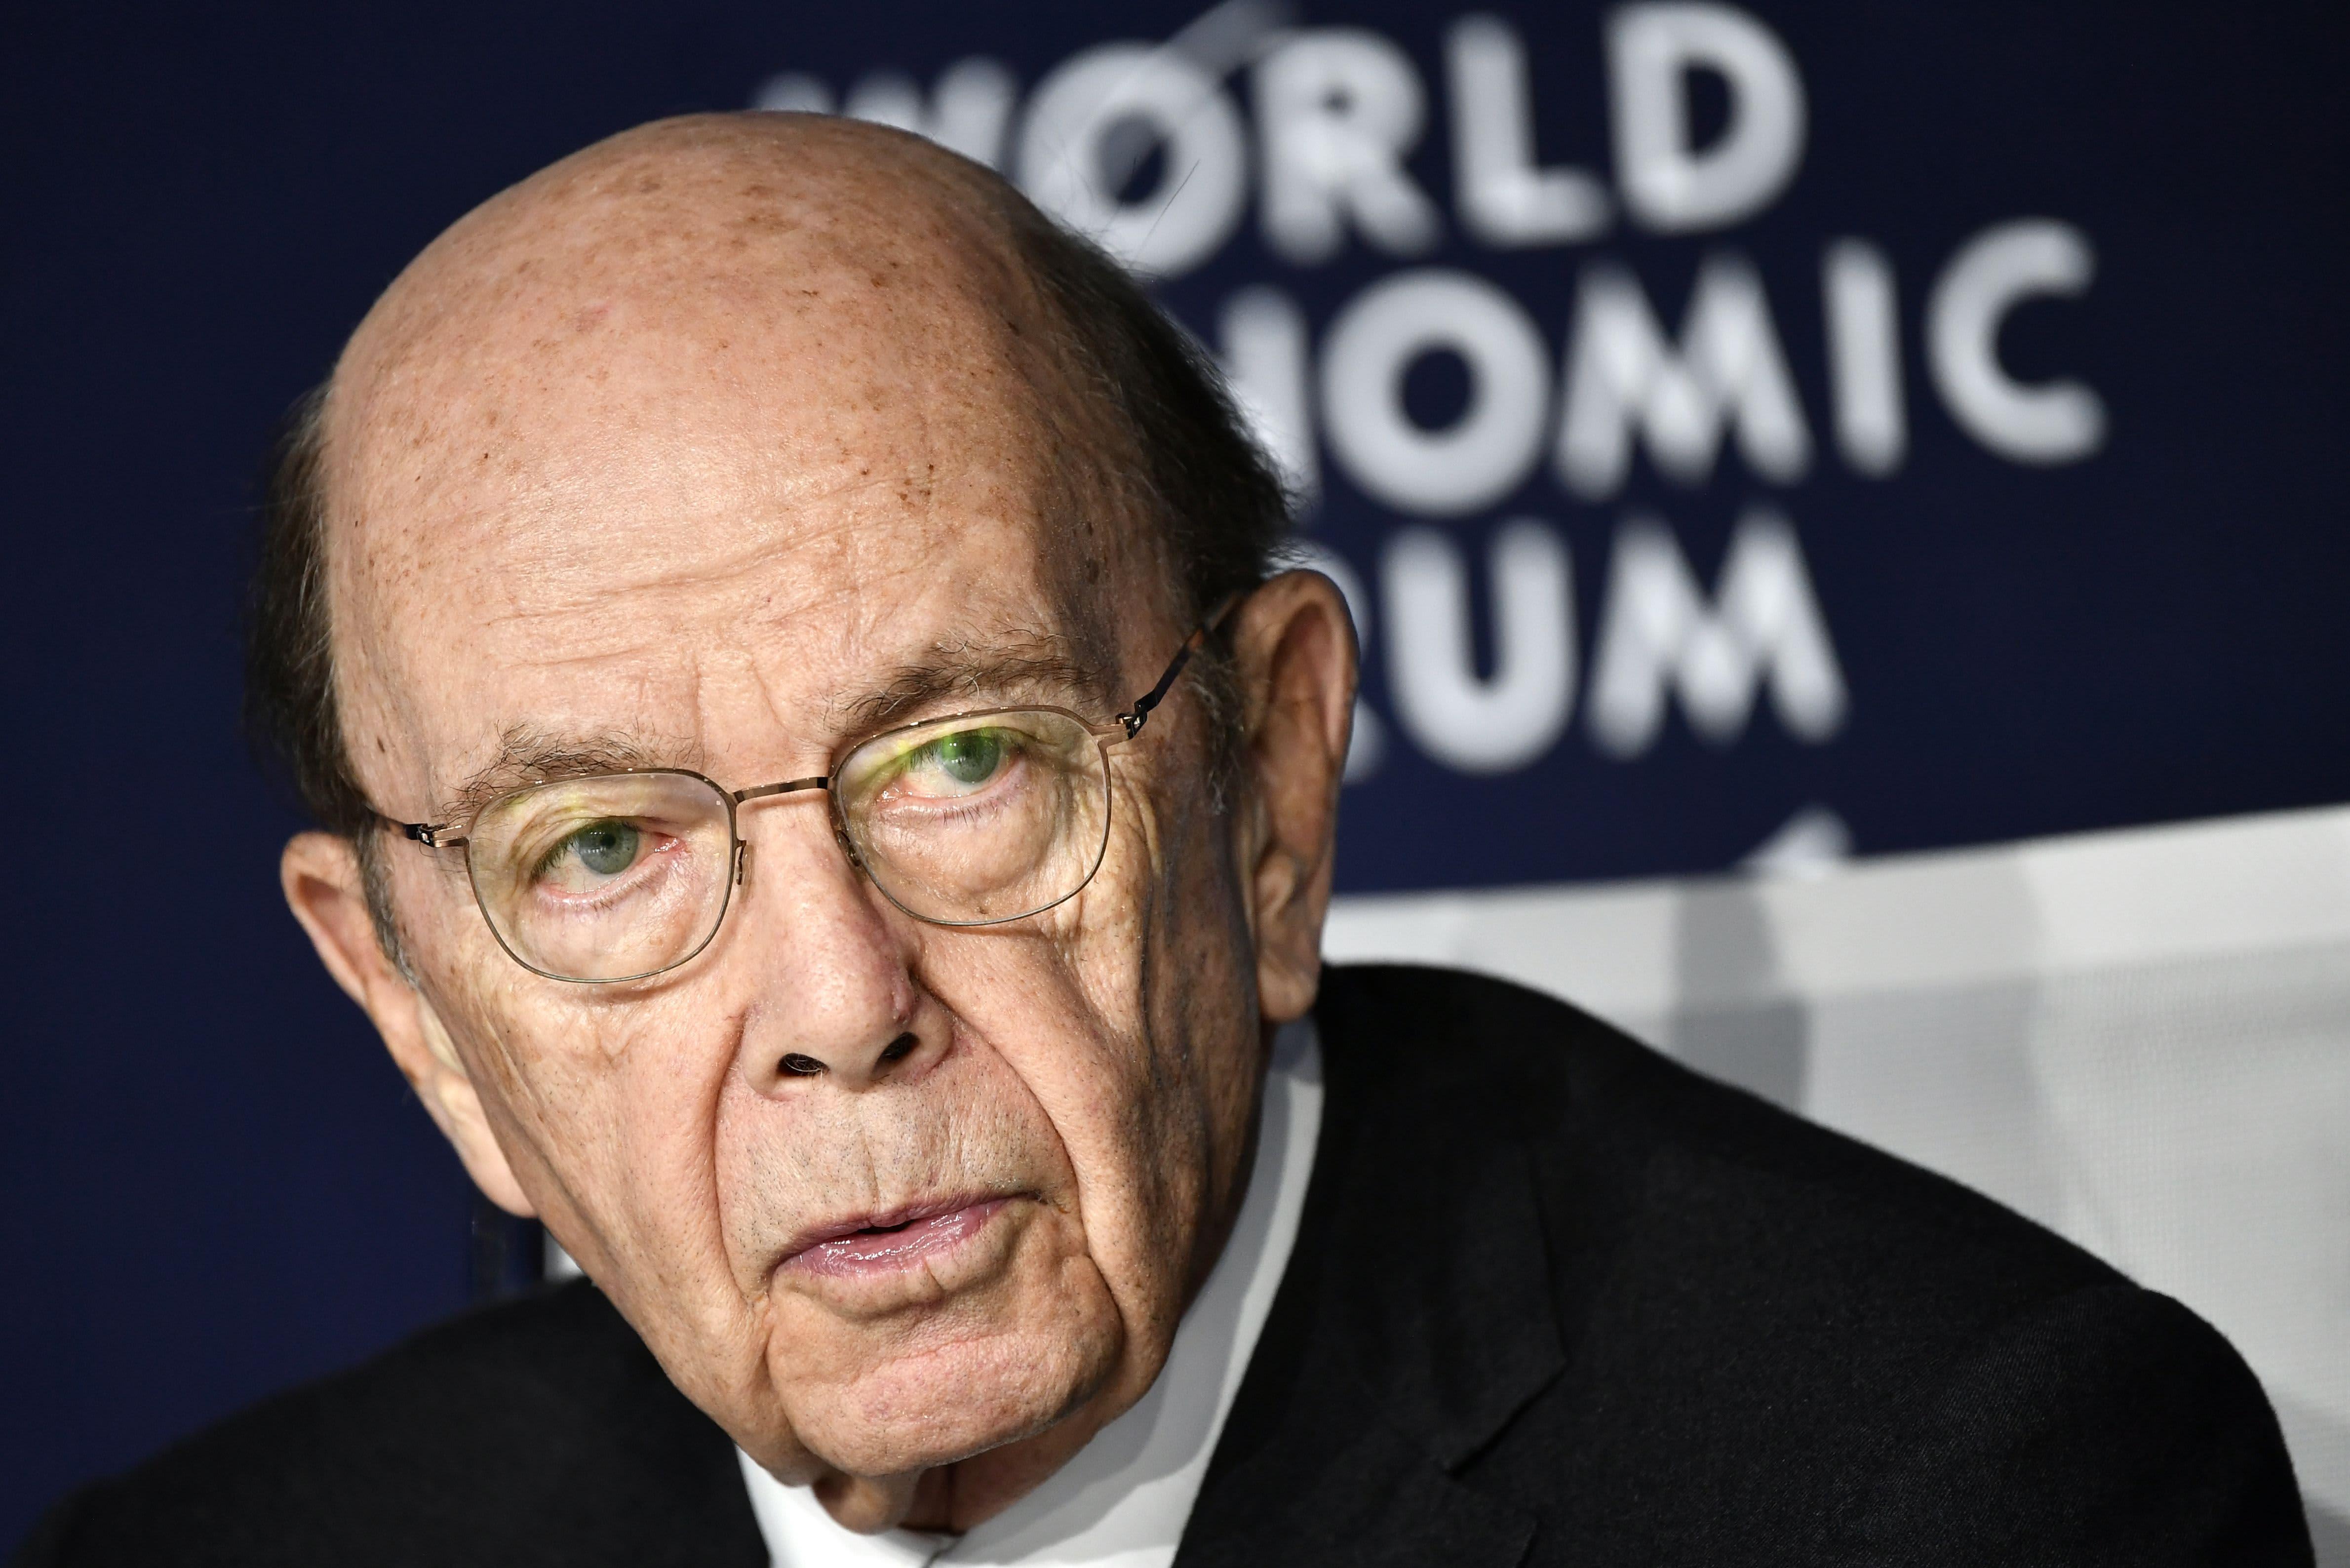 The US could still put tariffs on EU carmakers despite new trade talks, Wilbur Ross says